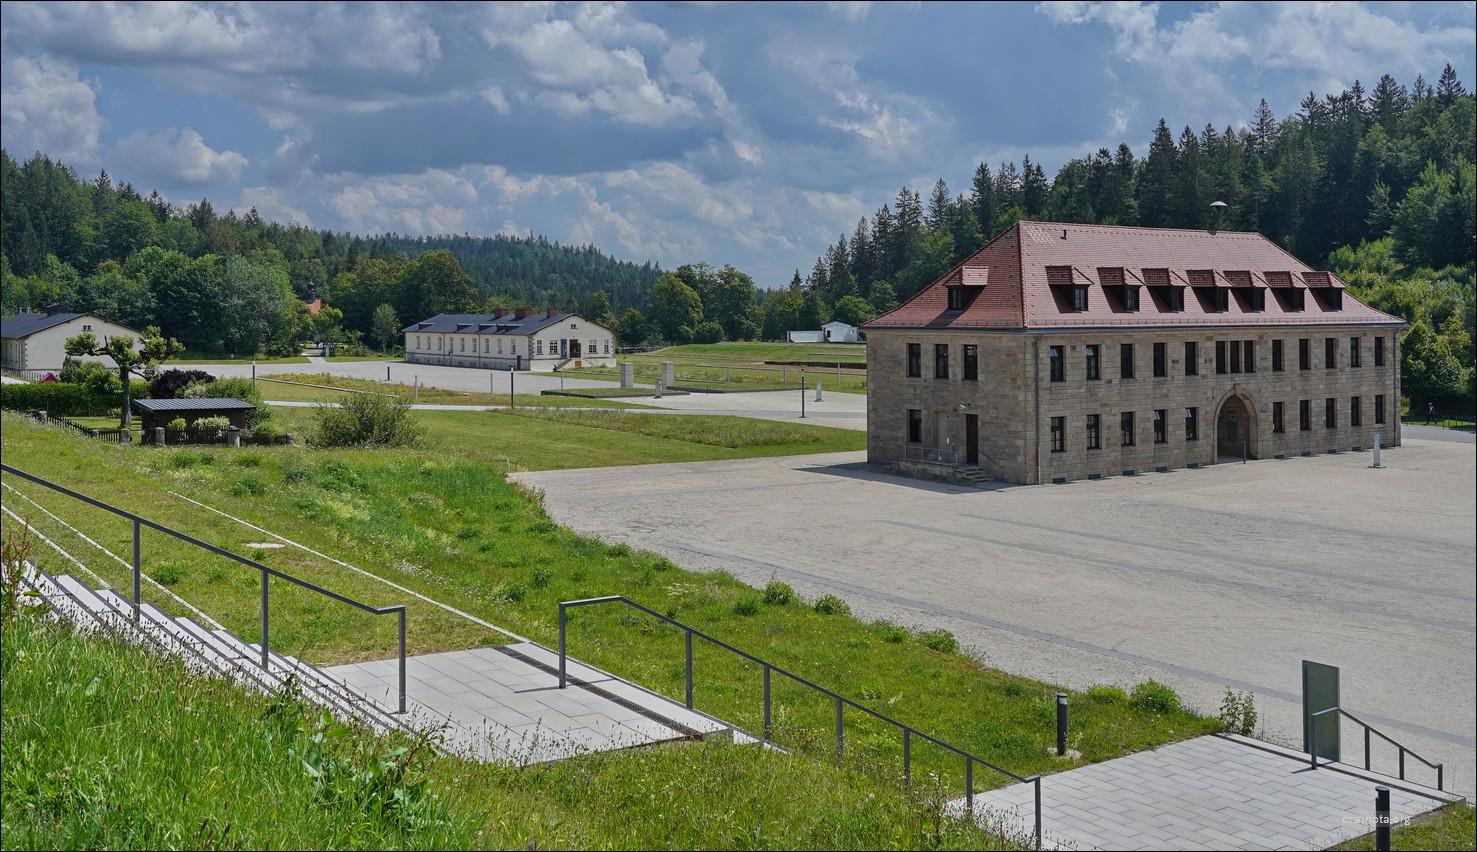 Niemcy, Germany, Obóz Koncentracyjny Flossenbürg, KL Flossenborg – kasyno SS, komendantura, kuchnia